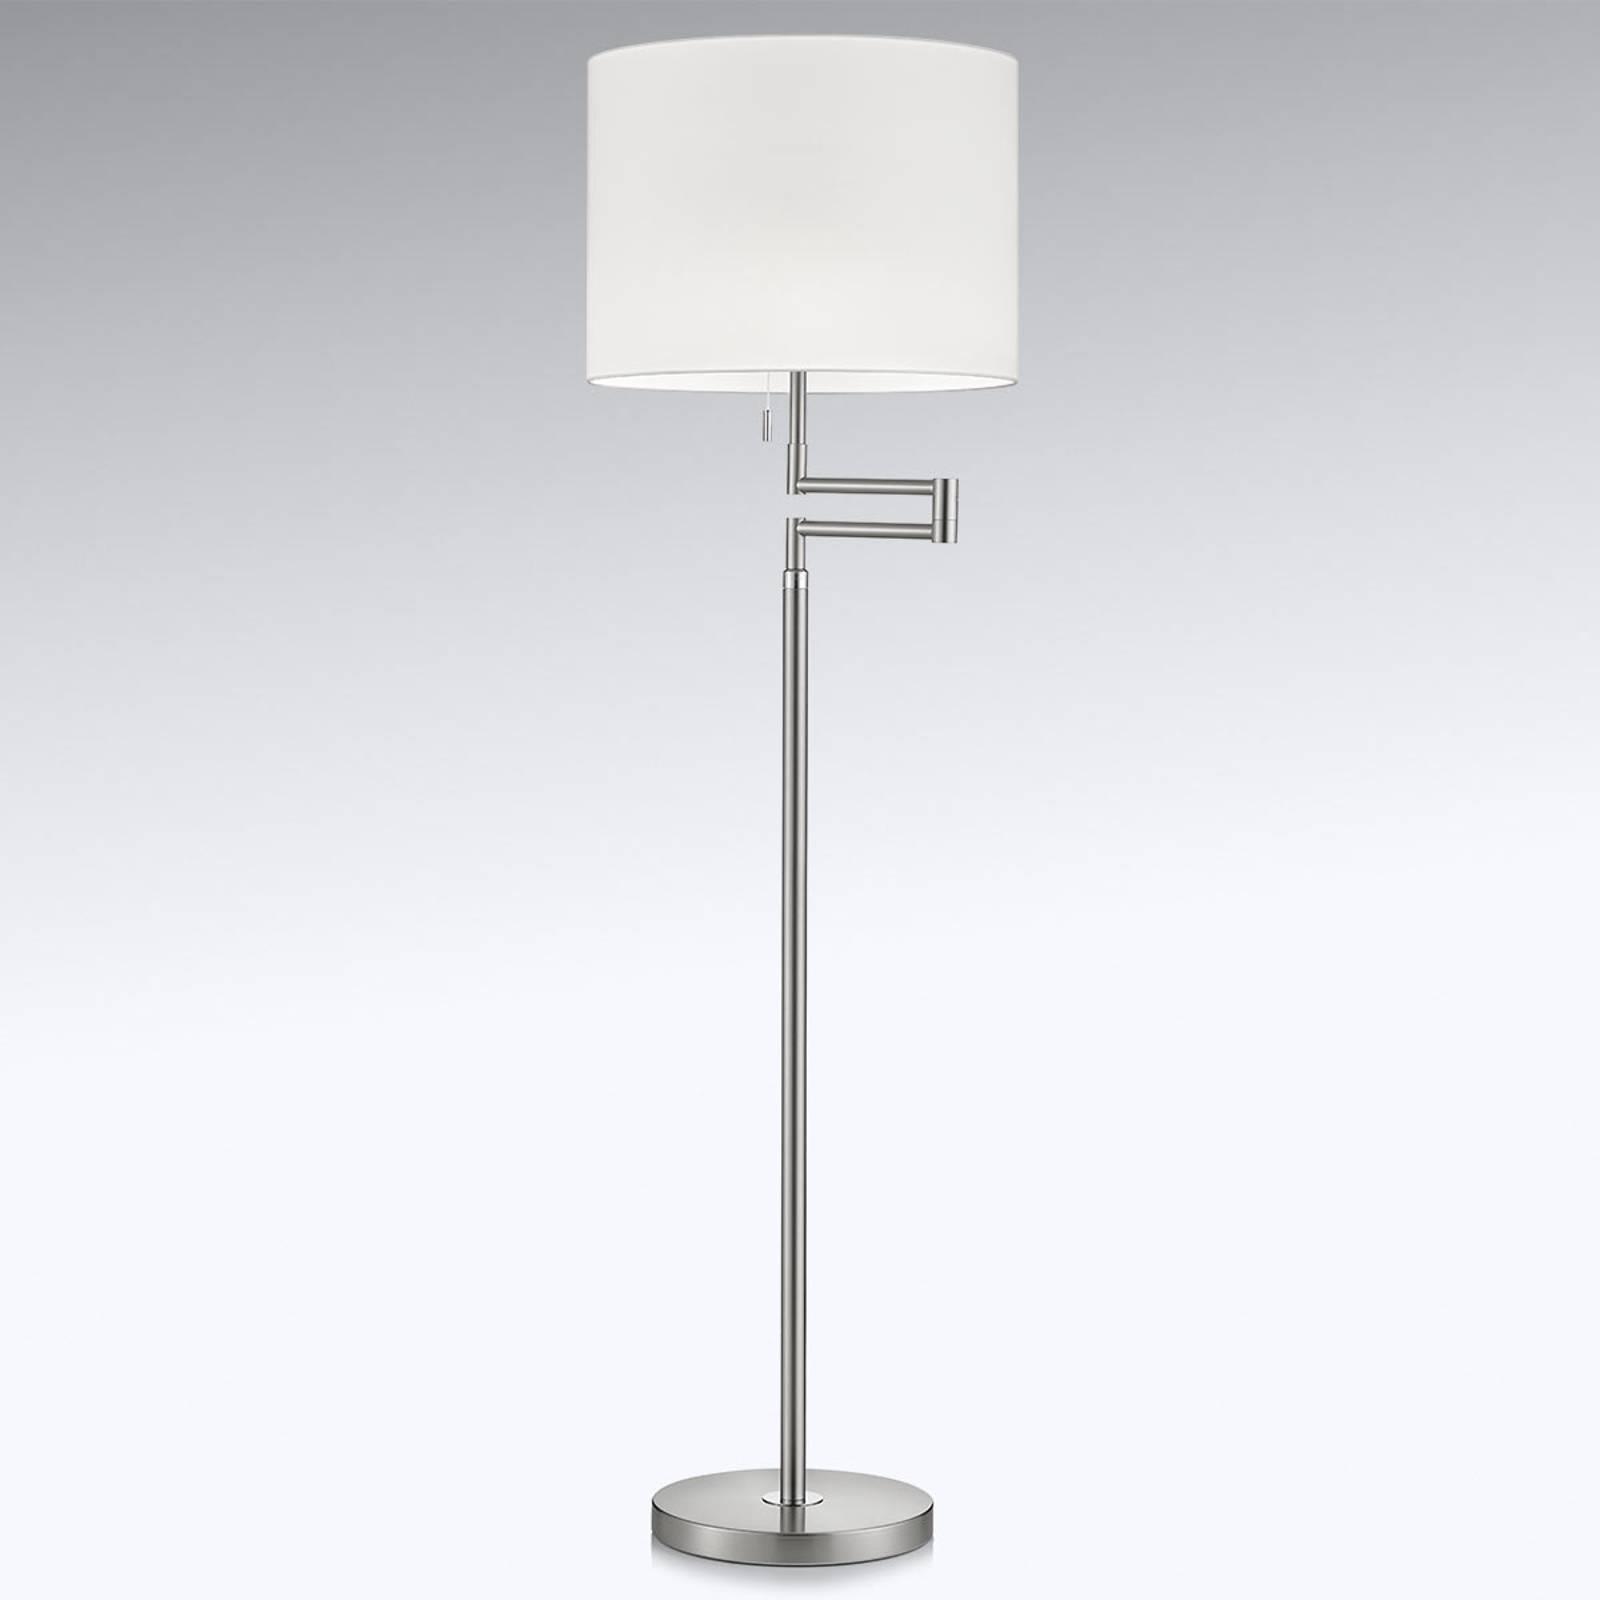 Stehleuchte Lilian, LED-Dimmer, nickel matt/chrom